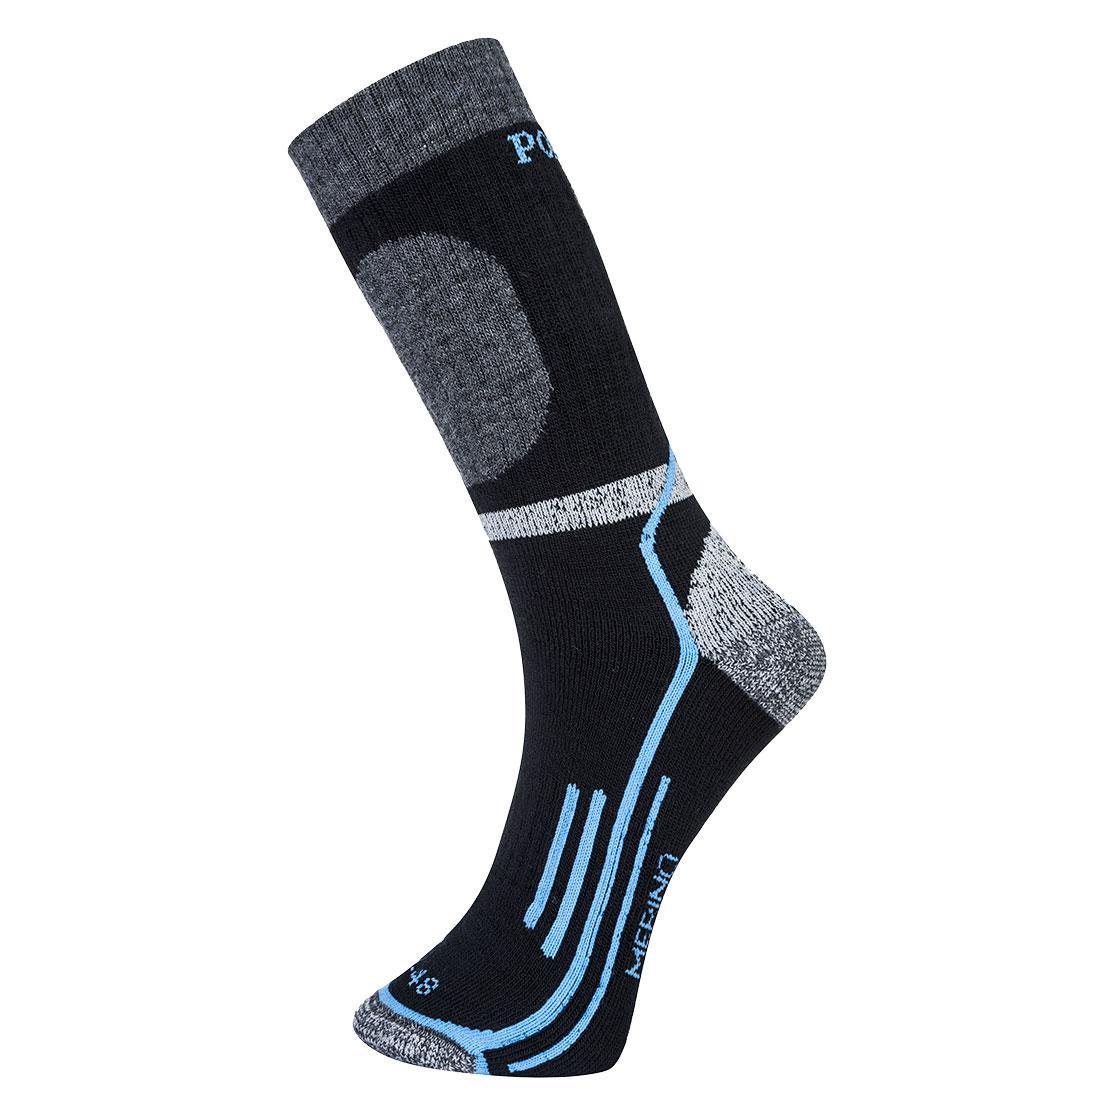 Winter Merino Sock Black 44-48R